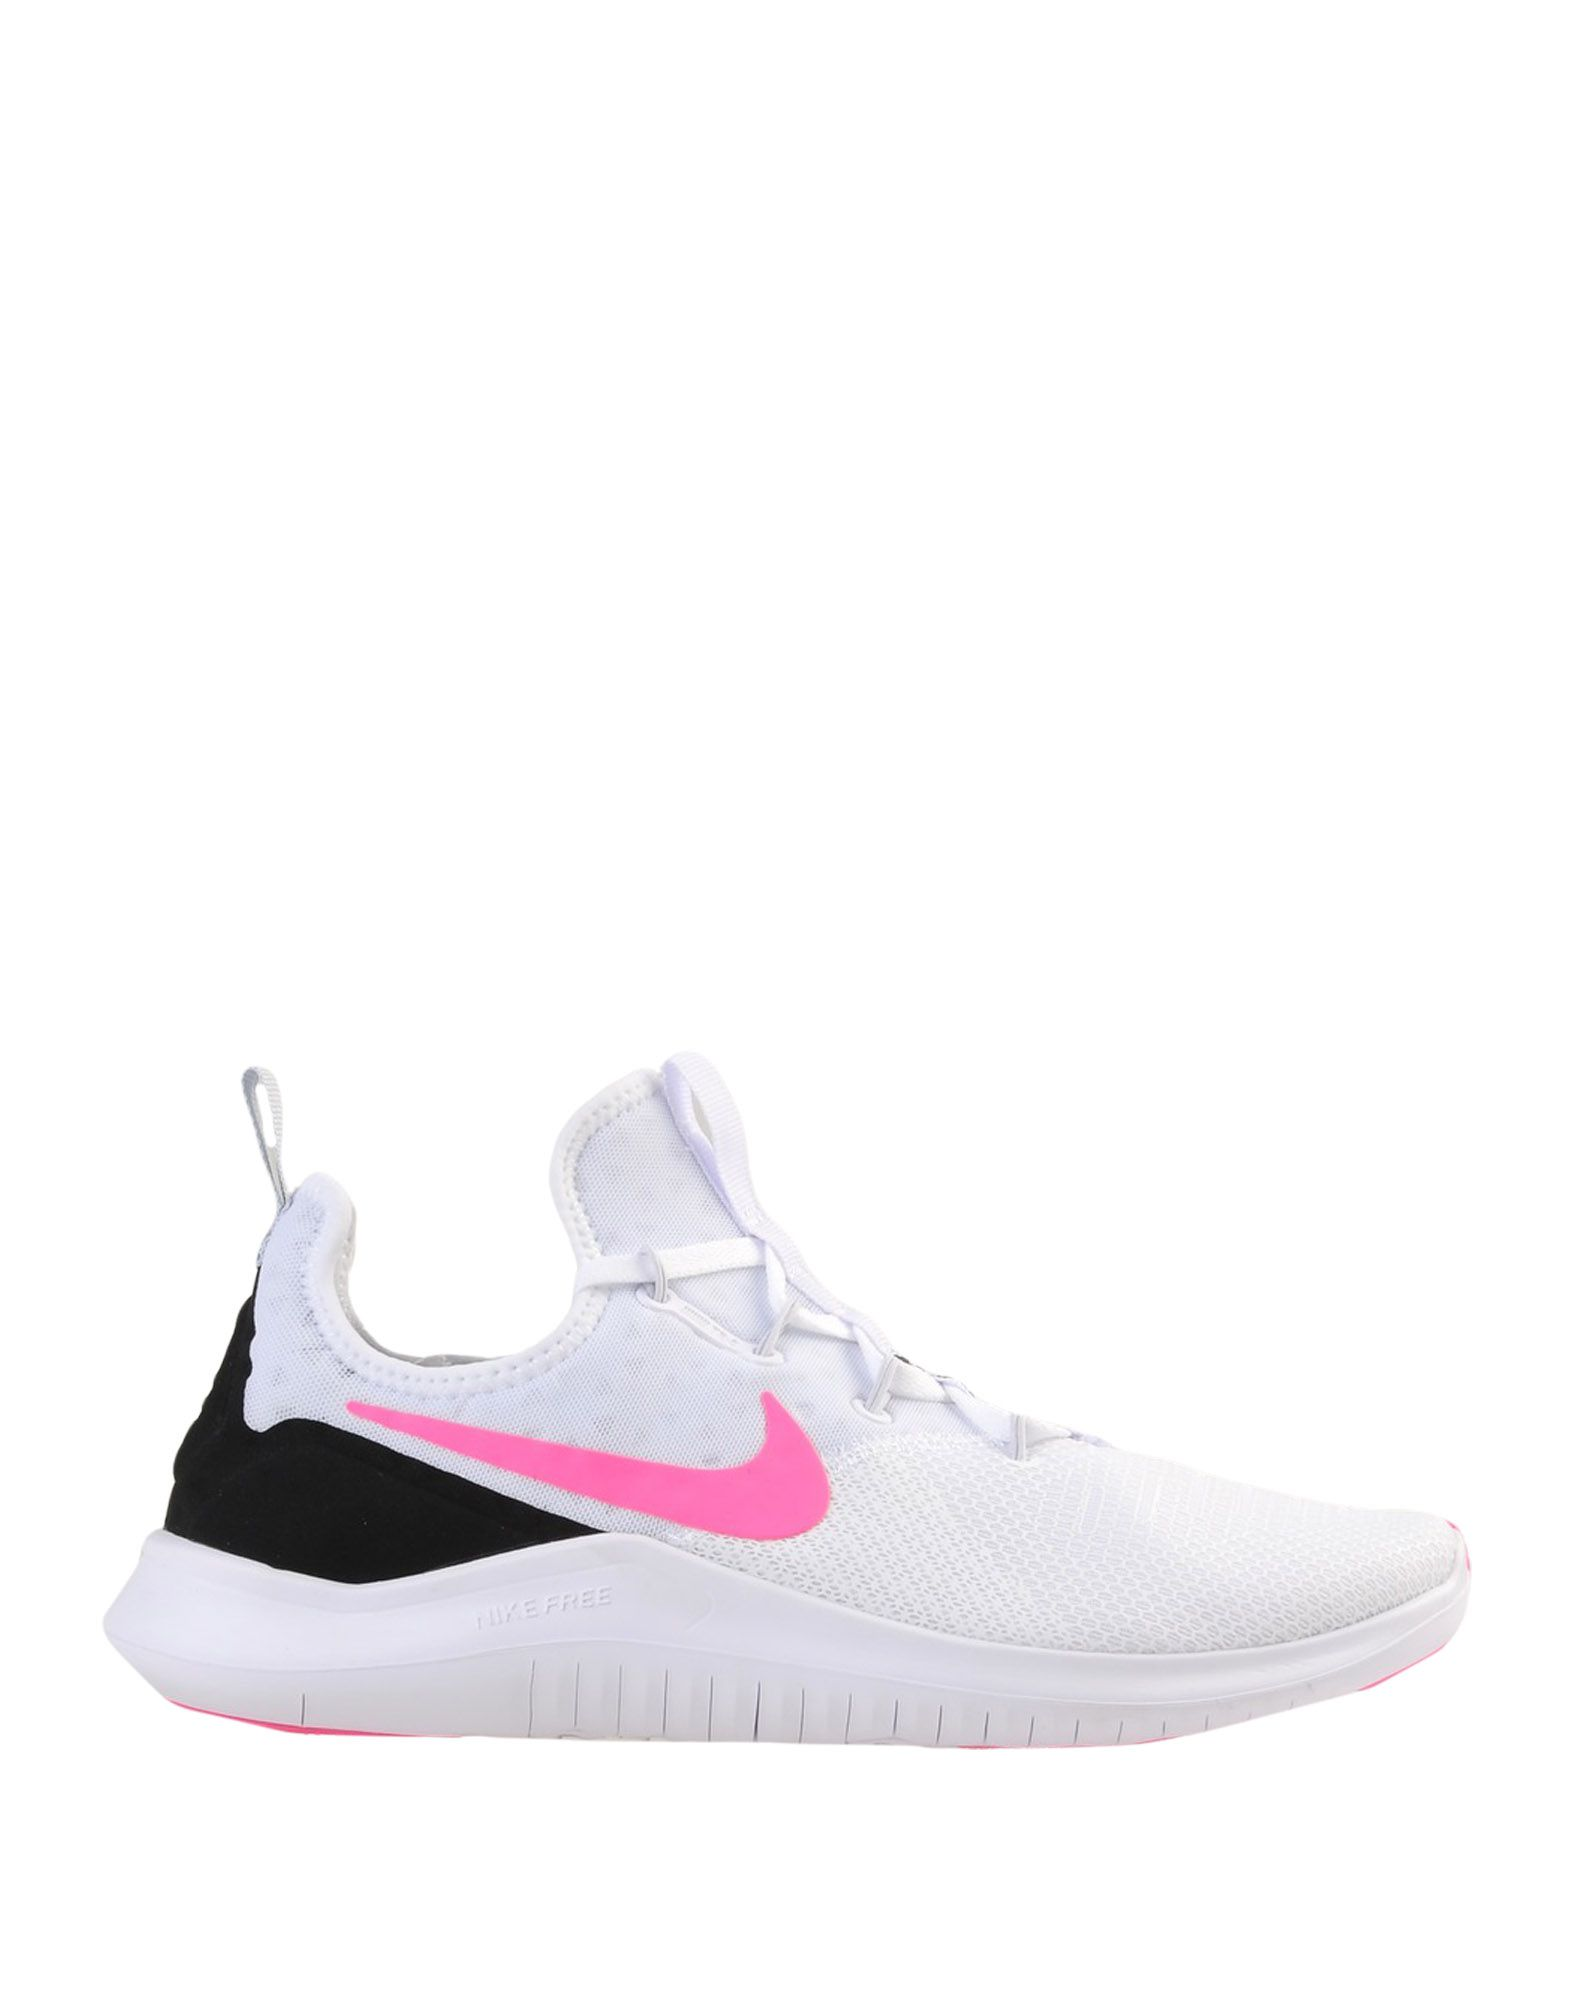 Baskets Nike   Free Tr 8 - Femme - Baskets Nike Blanc Chaussures femme pas cher homme et femme